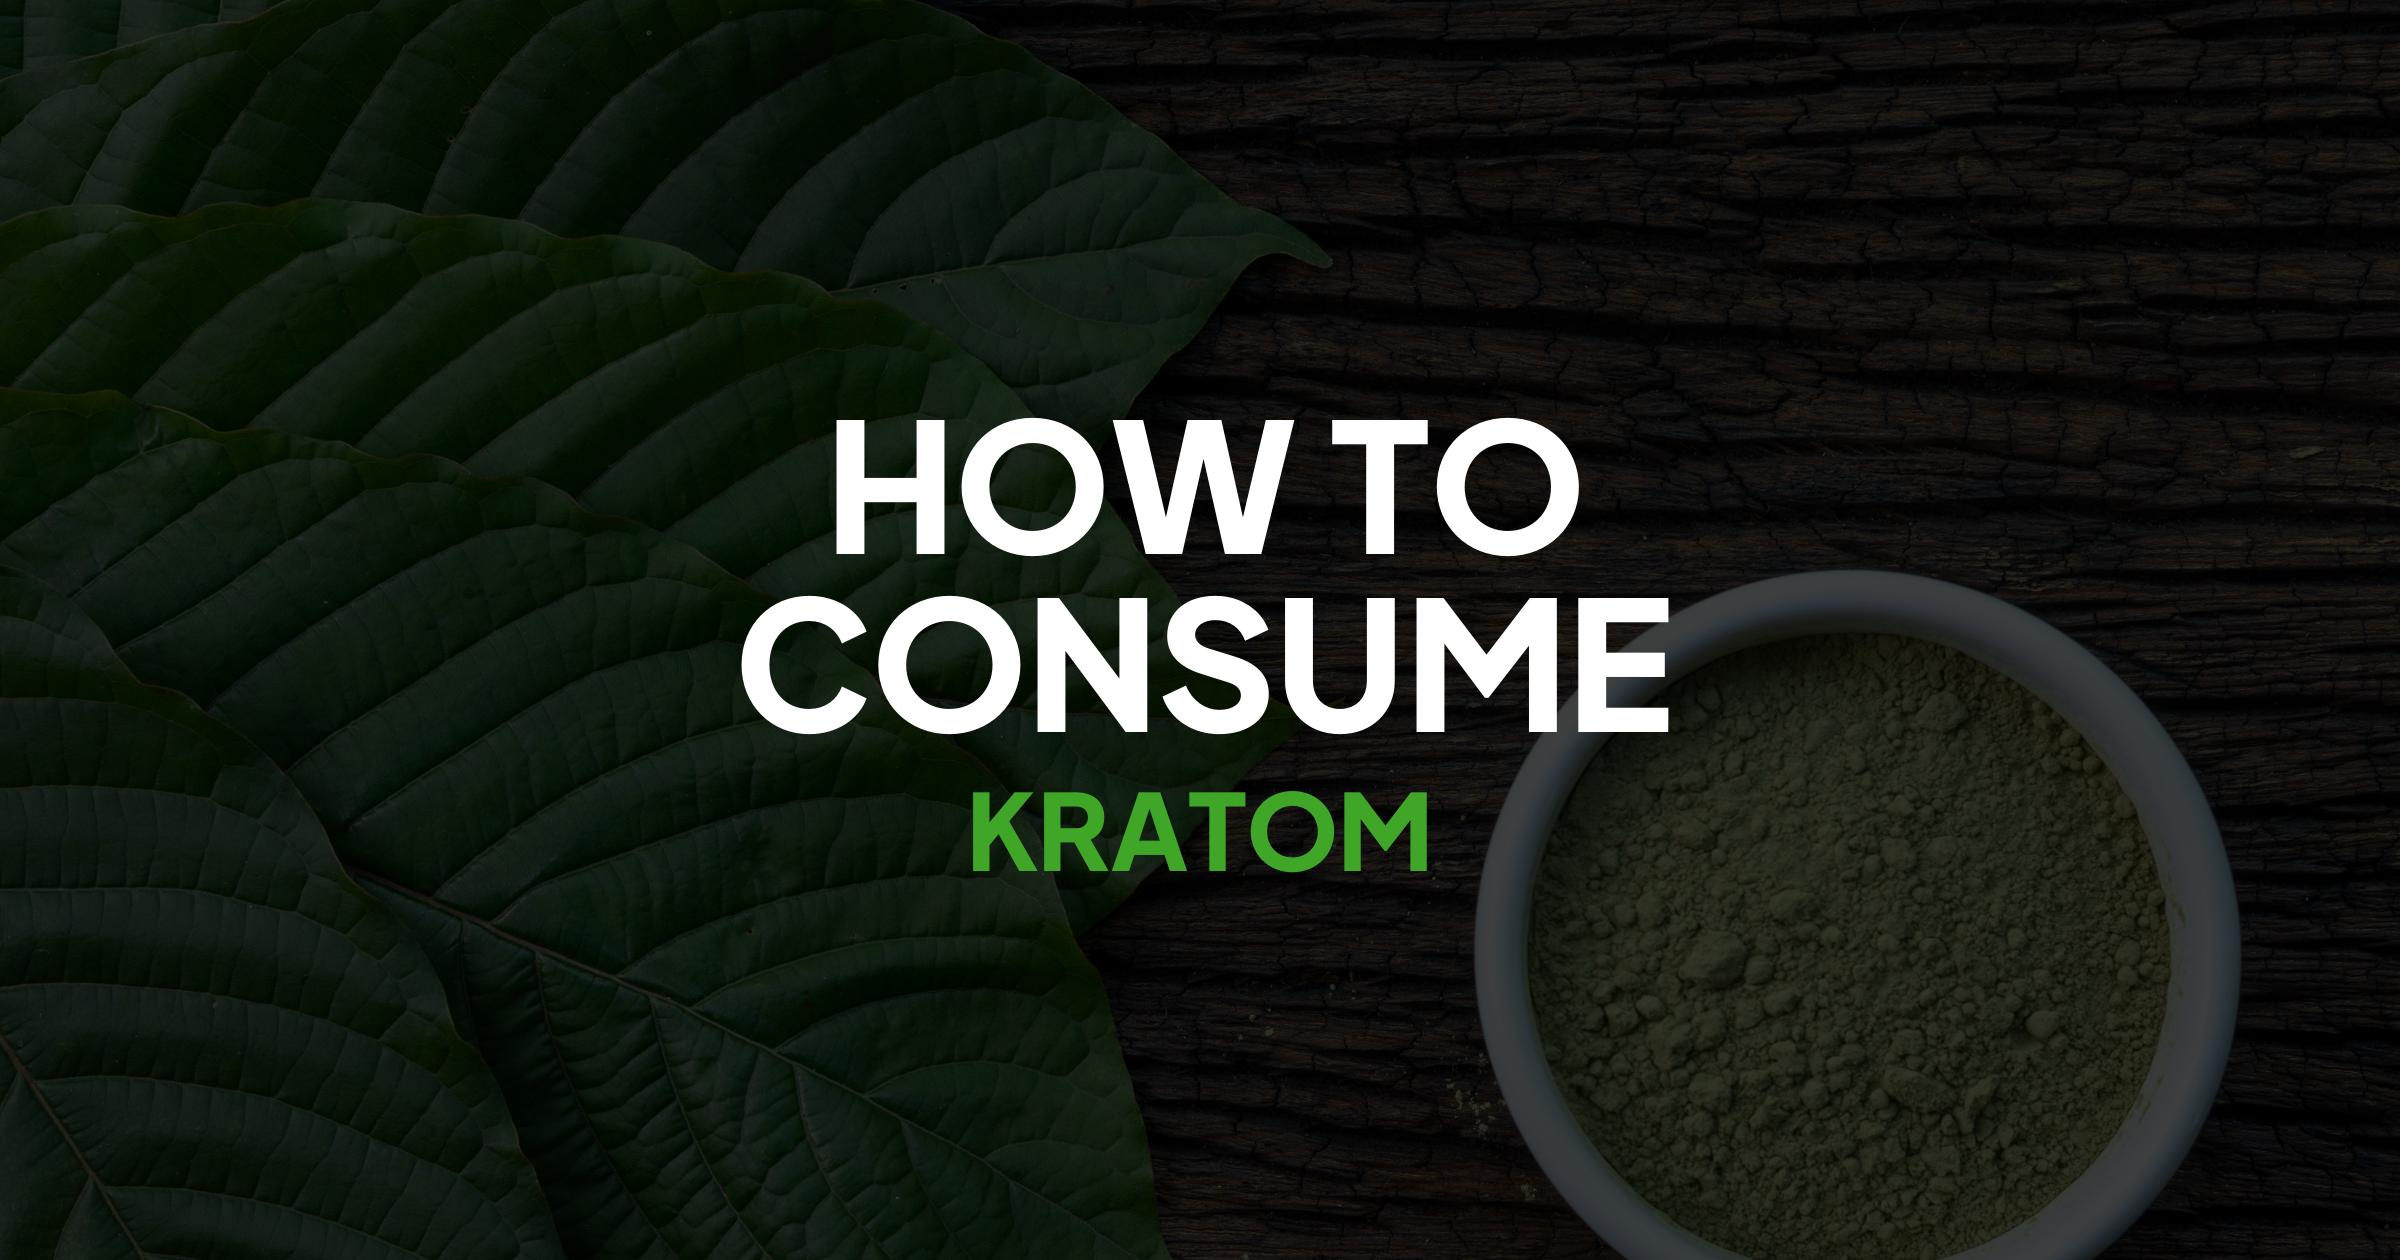 How to Consume Kratom